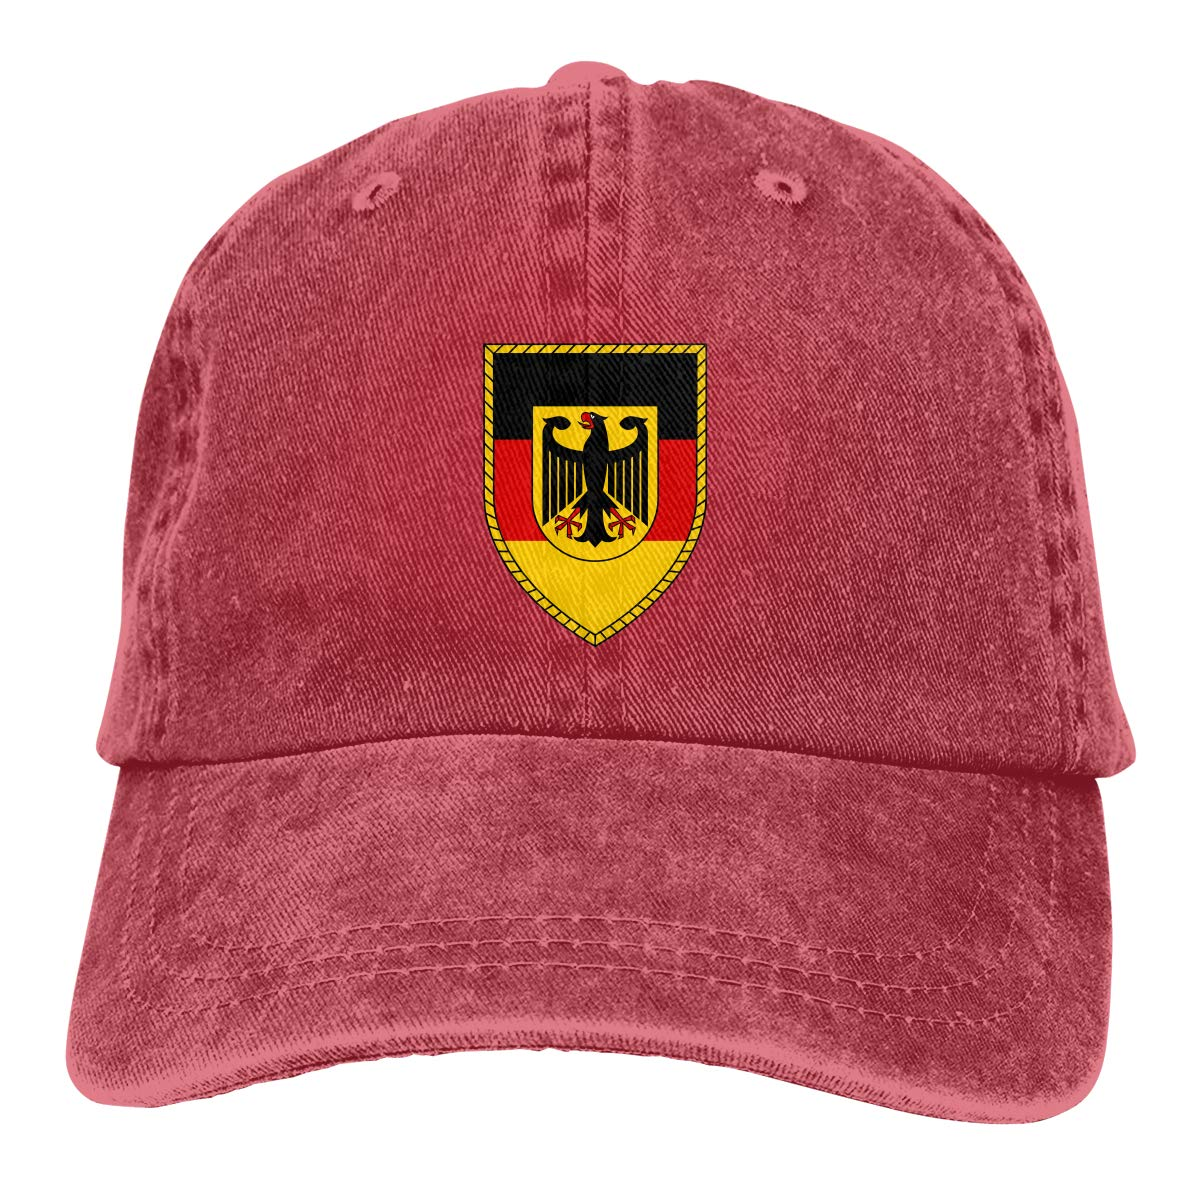 Sajfirlug Bundeswehr Logo with Text Fashion Adjustable Cowboy Cap Denim Hat for Women and Men